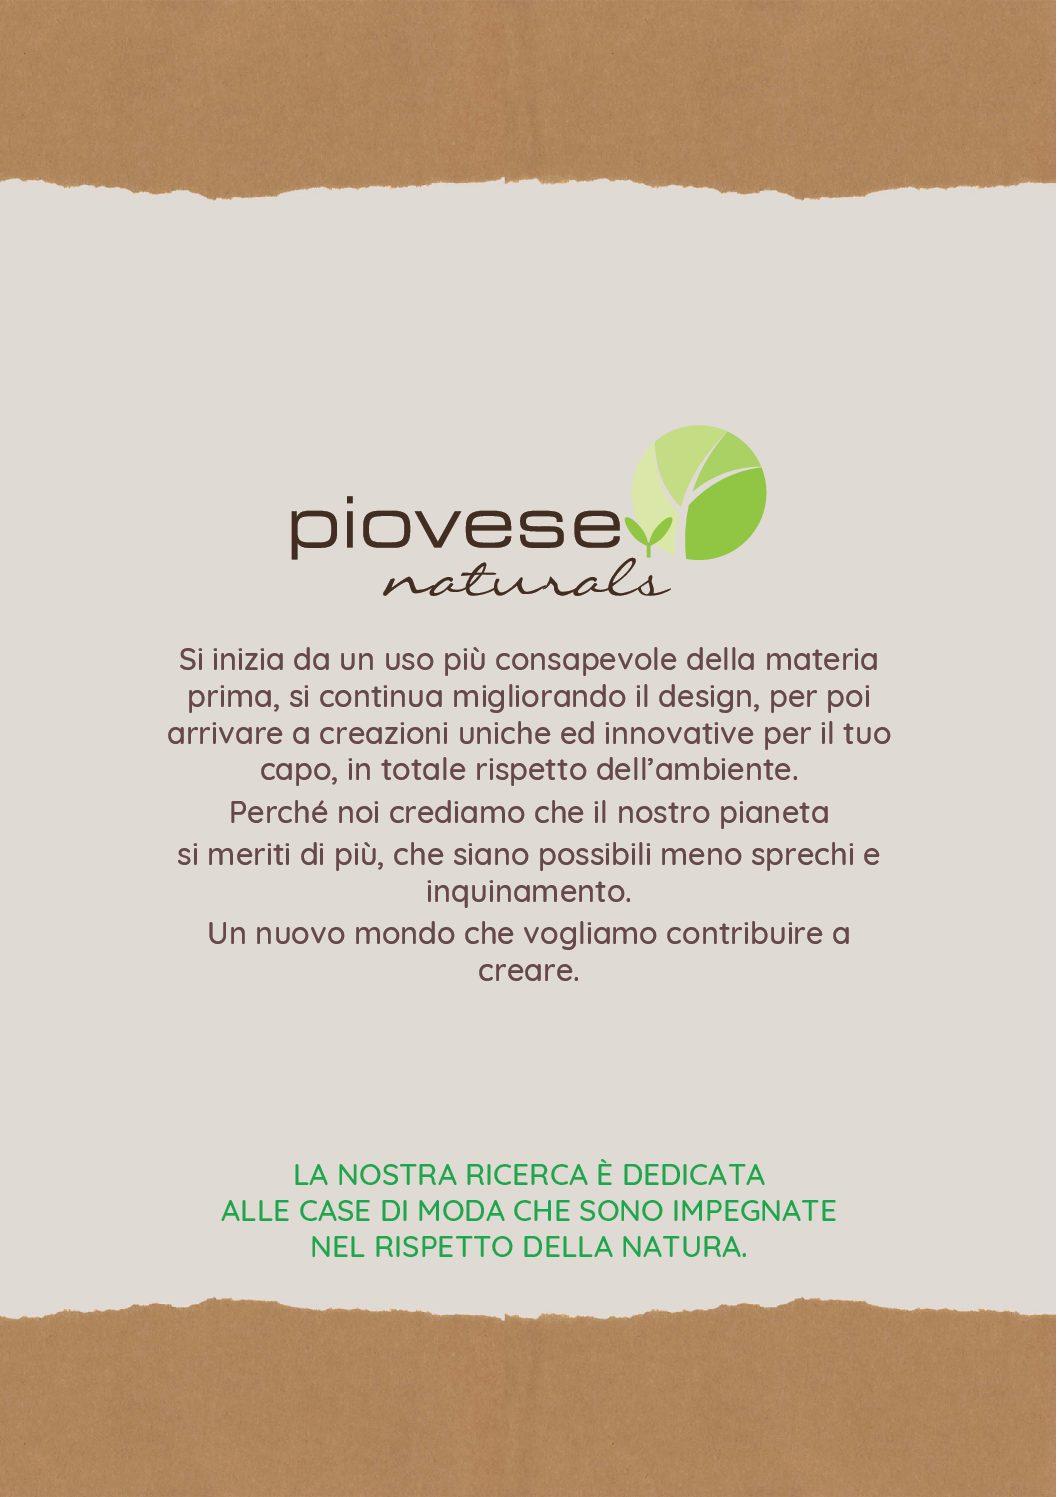 Diaro_Sostenibile_piovese